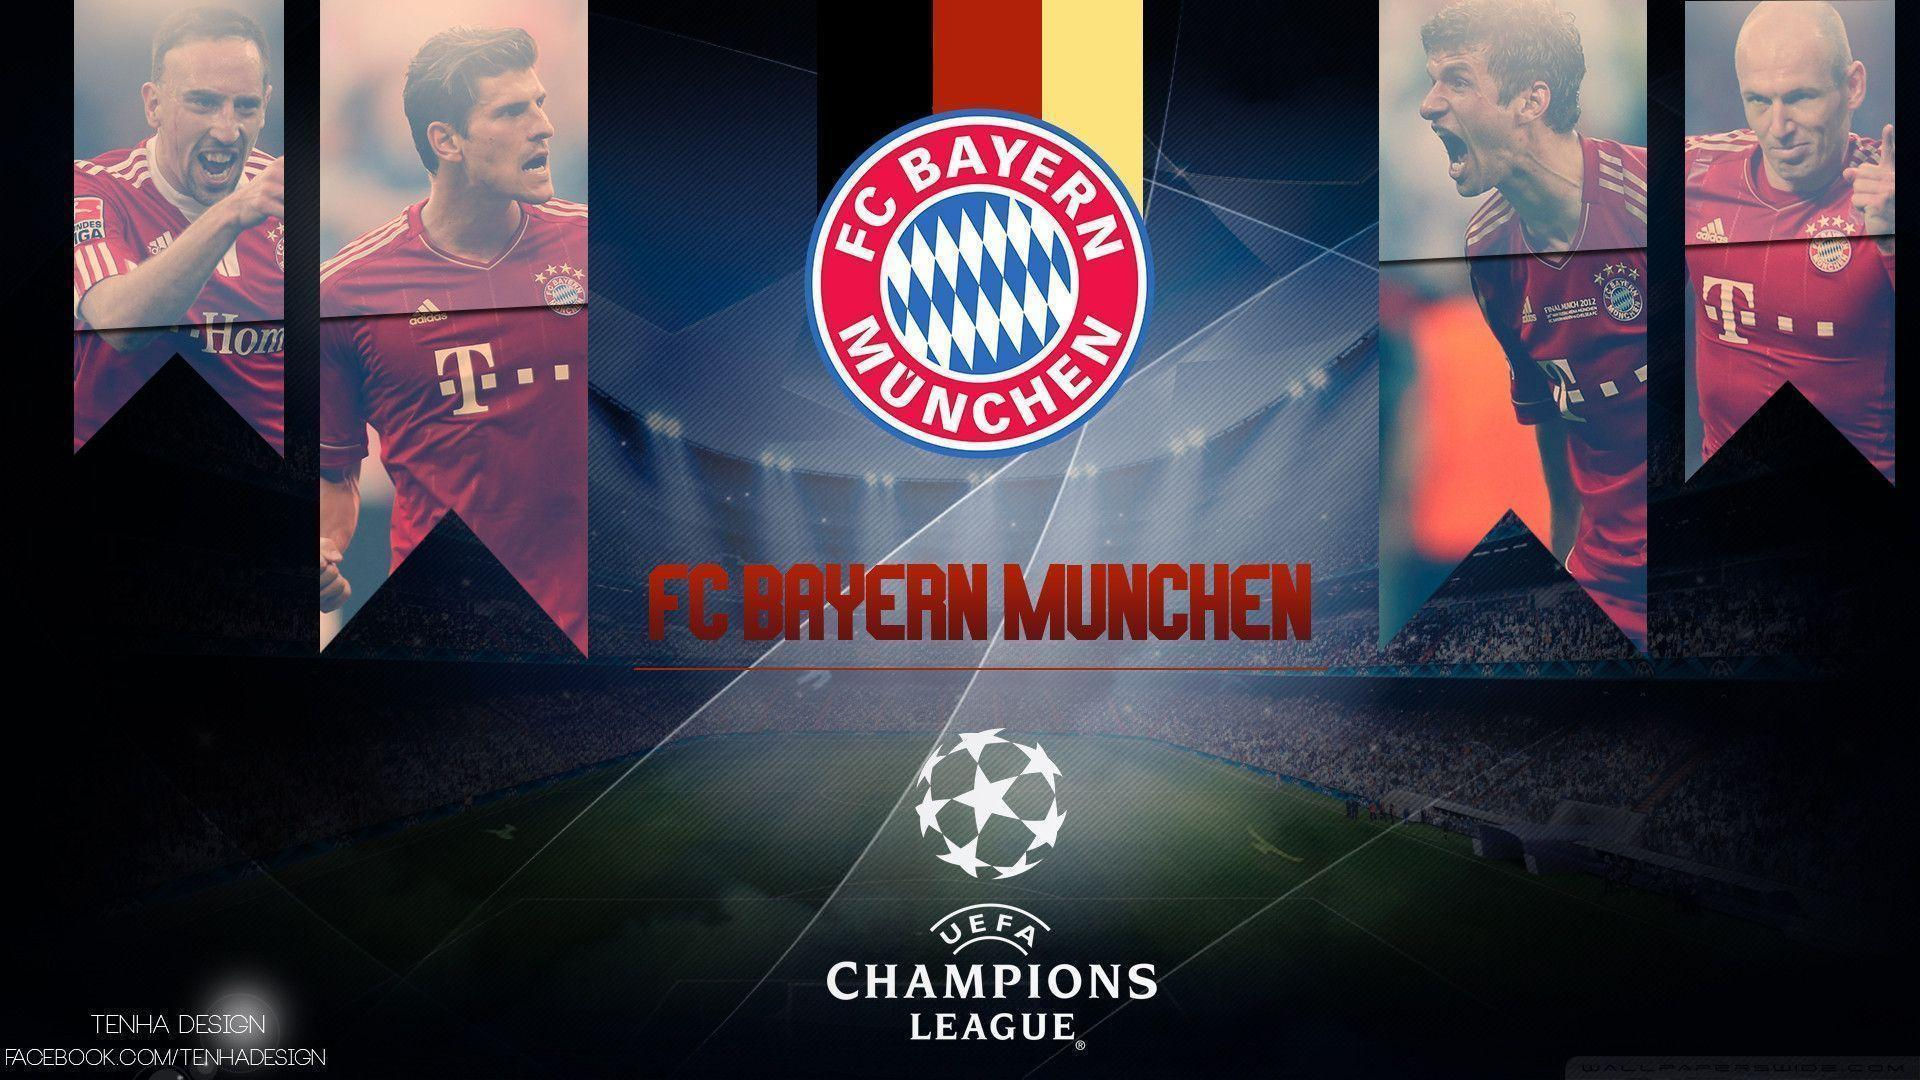 Bayern Munich FC Windows 8 Wallpapers   Download free windows 8 hd ...